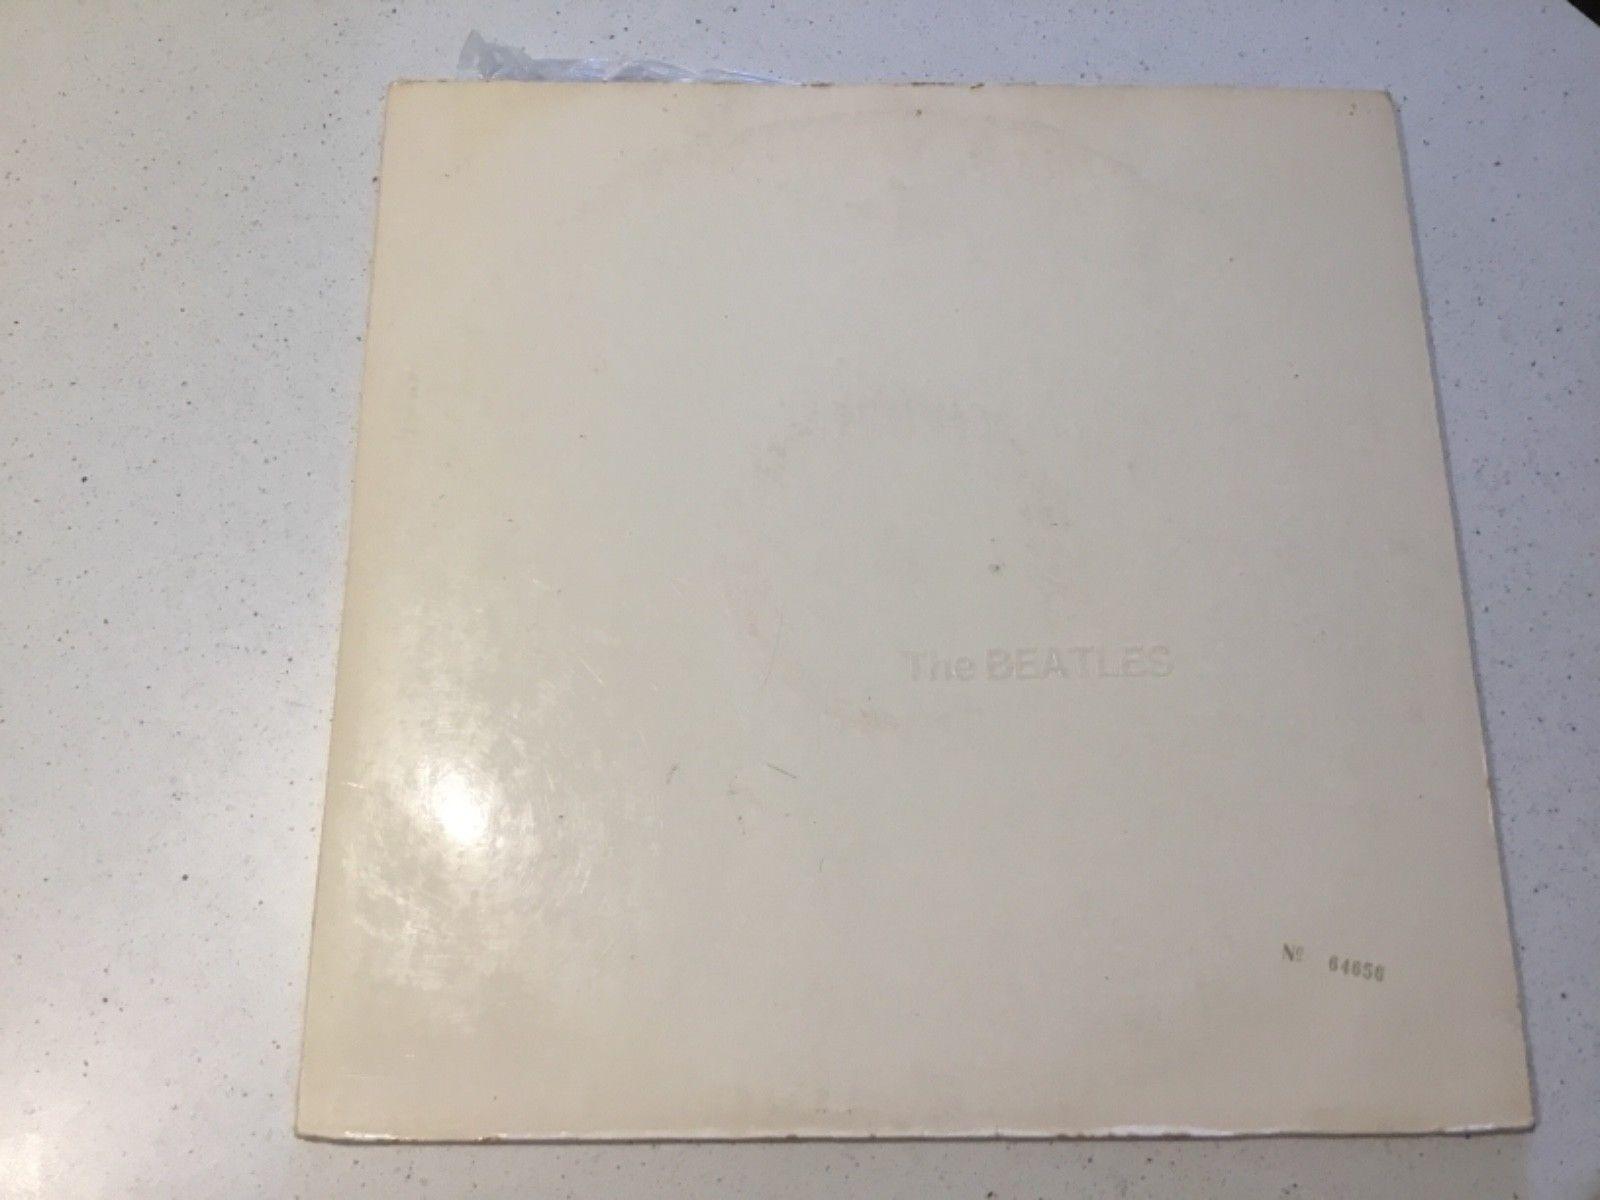 The Beatles The White Album oz original all inserts posters etc vinyl record LP